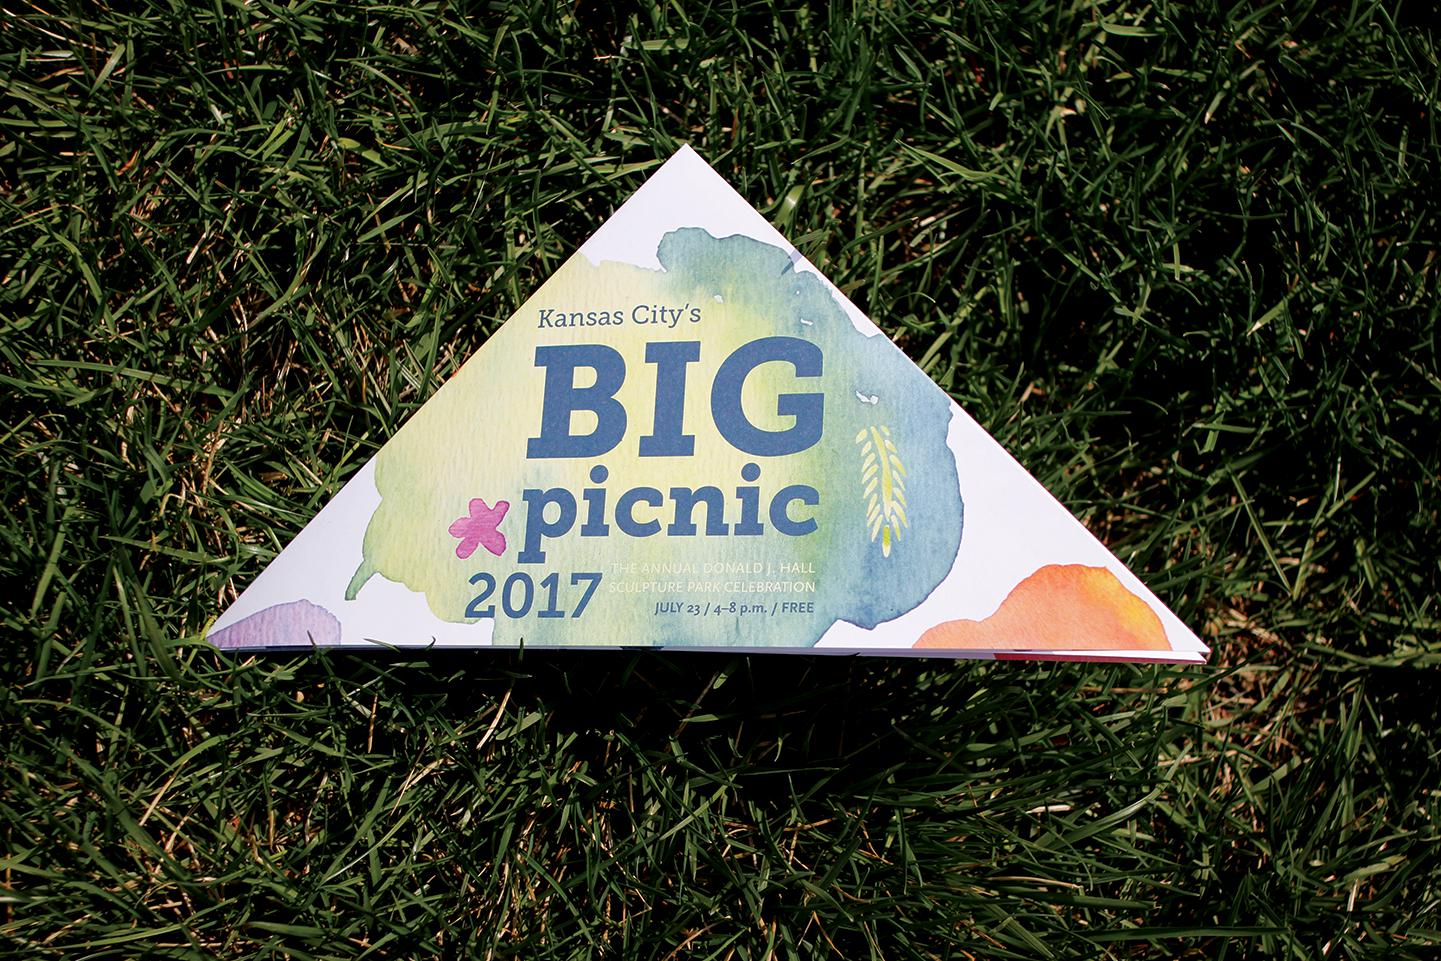 Kansas City's Big Picnic 2017 Map